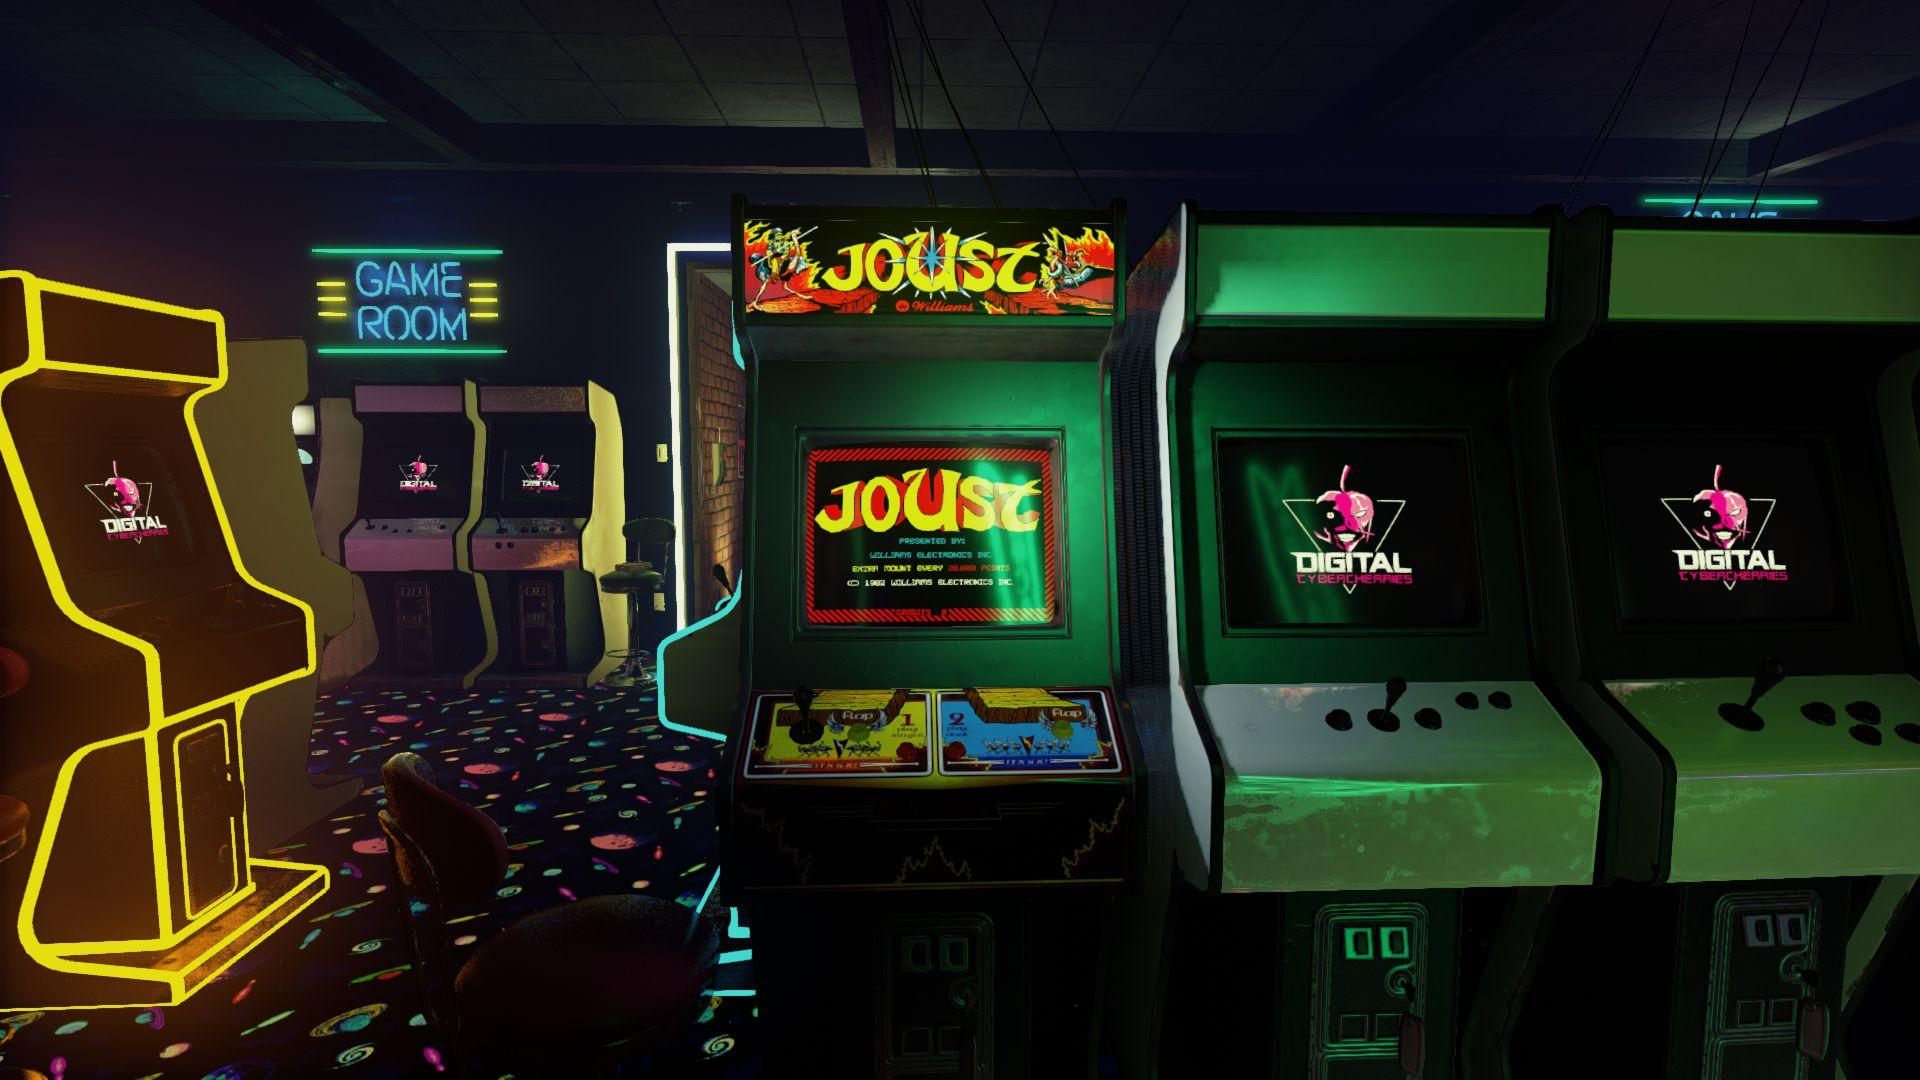 Gravity Falls Wallpaper Imgur Joust Arcade Cabinet Gravity Falls Arcade Gravity